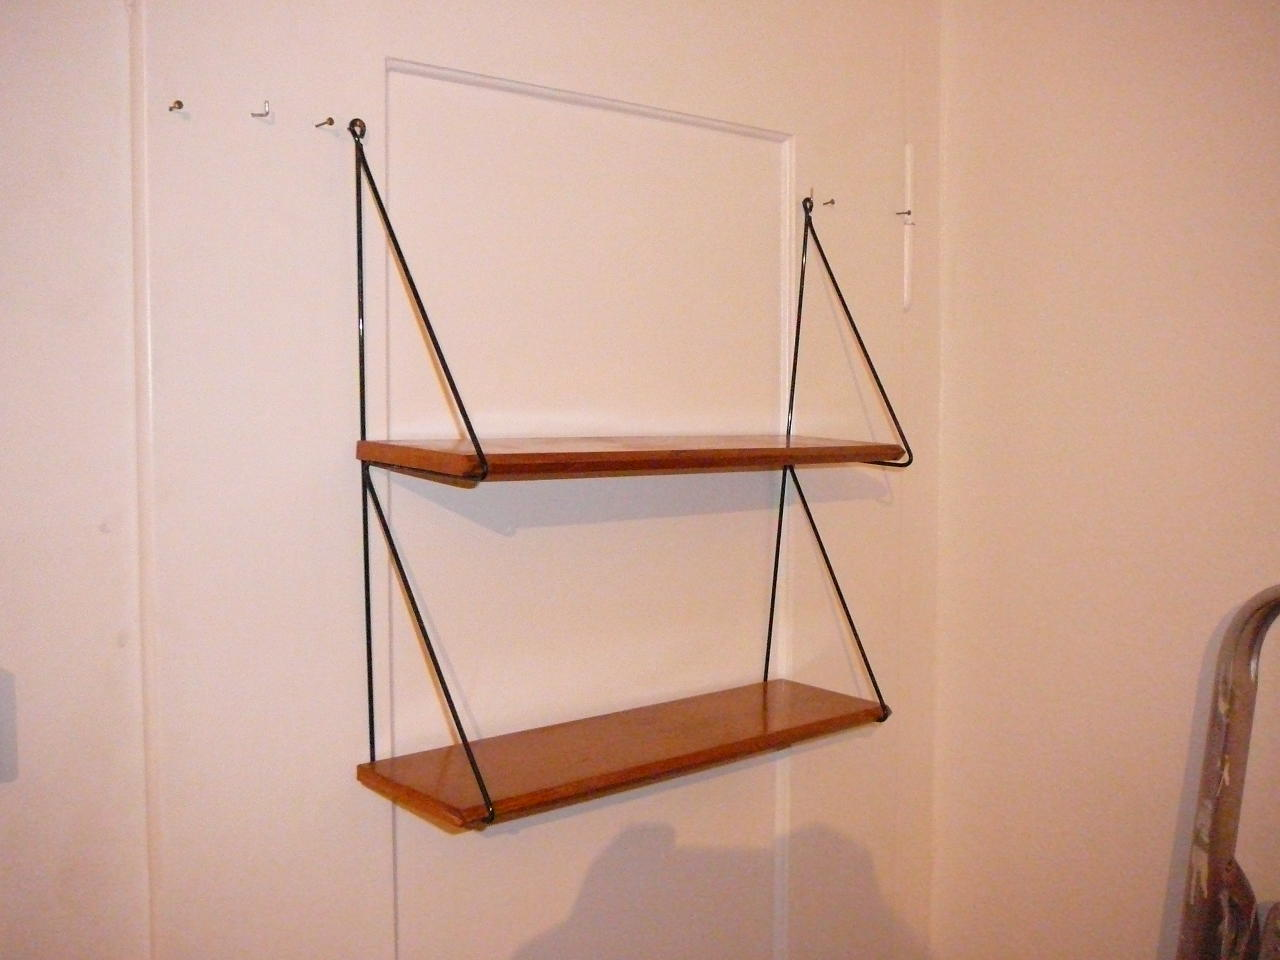 altes nissen string regal original in aarau kaufen bei. Black Bedroom Furniture Sets. Home Design Ideas